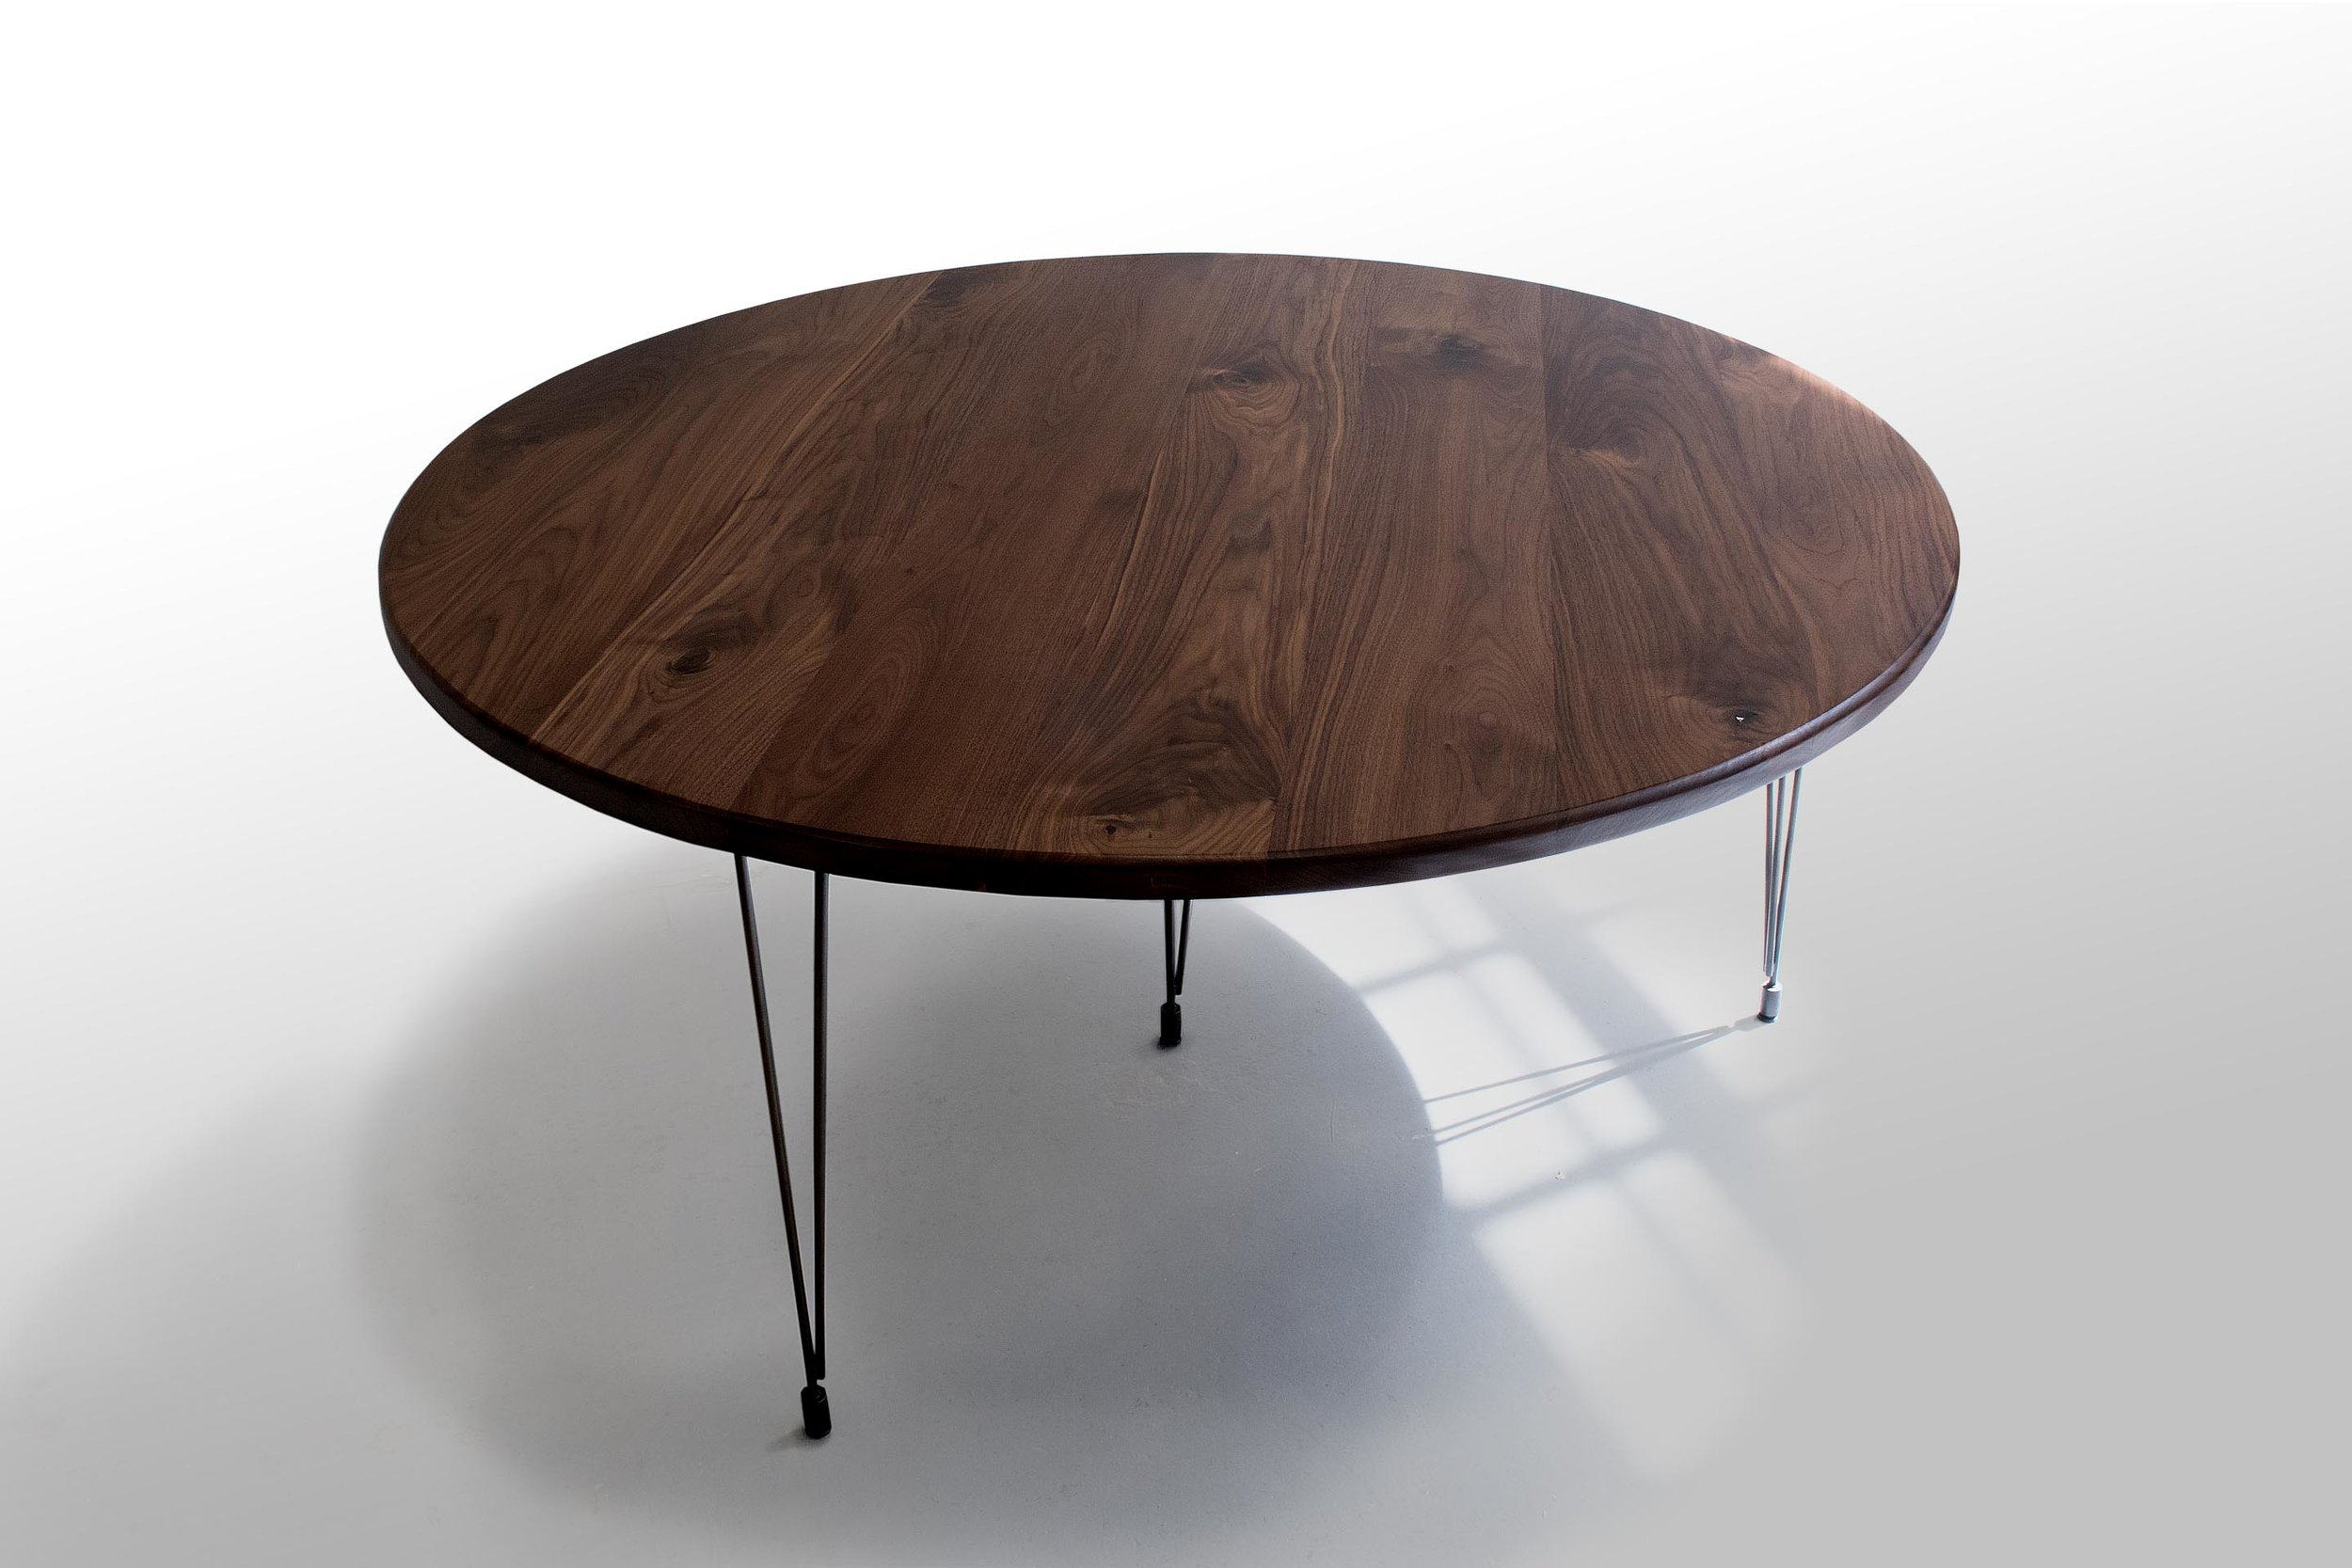 62 inch round walnut table.jpg